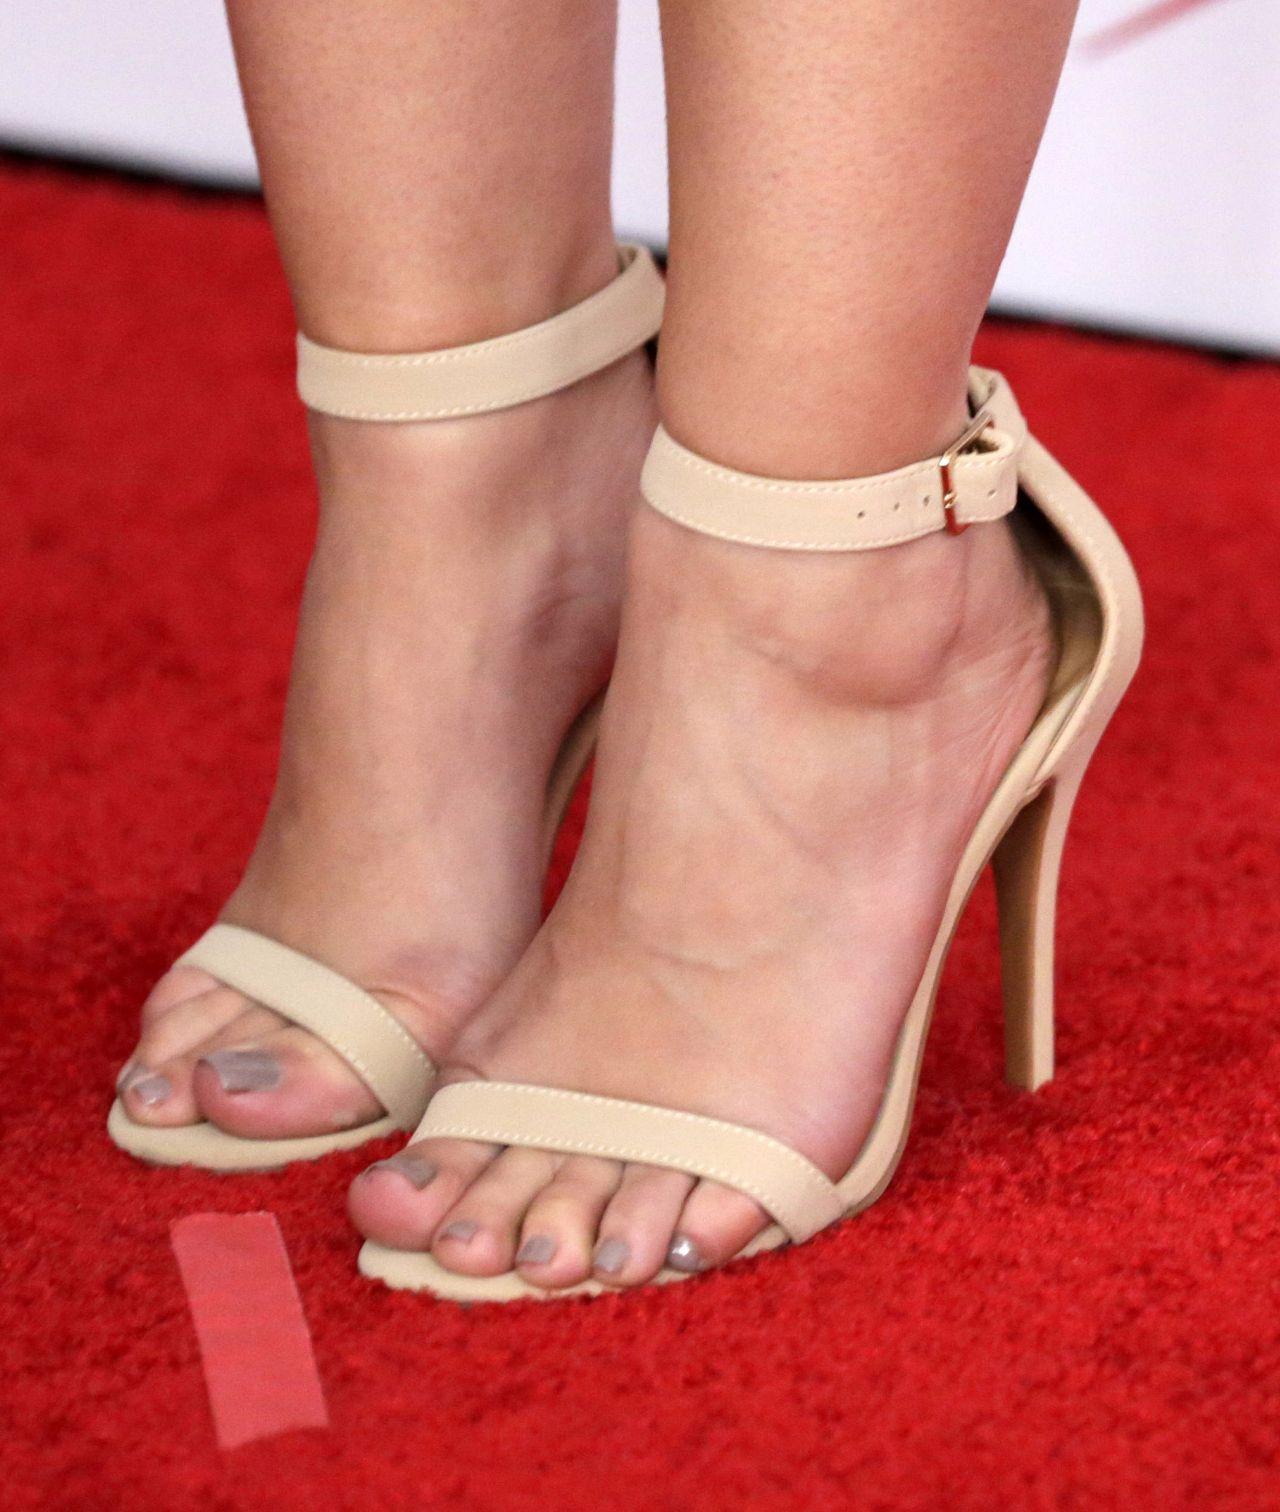 Bikini Feet Ashley Laconetti naked photo 2017